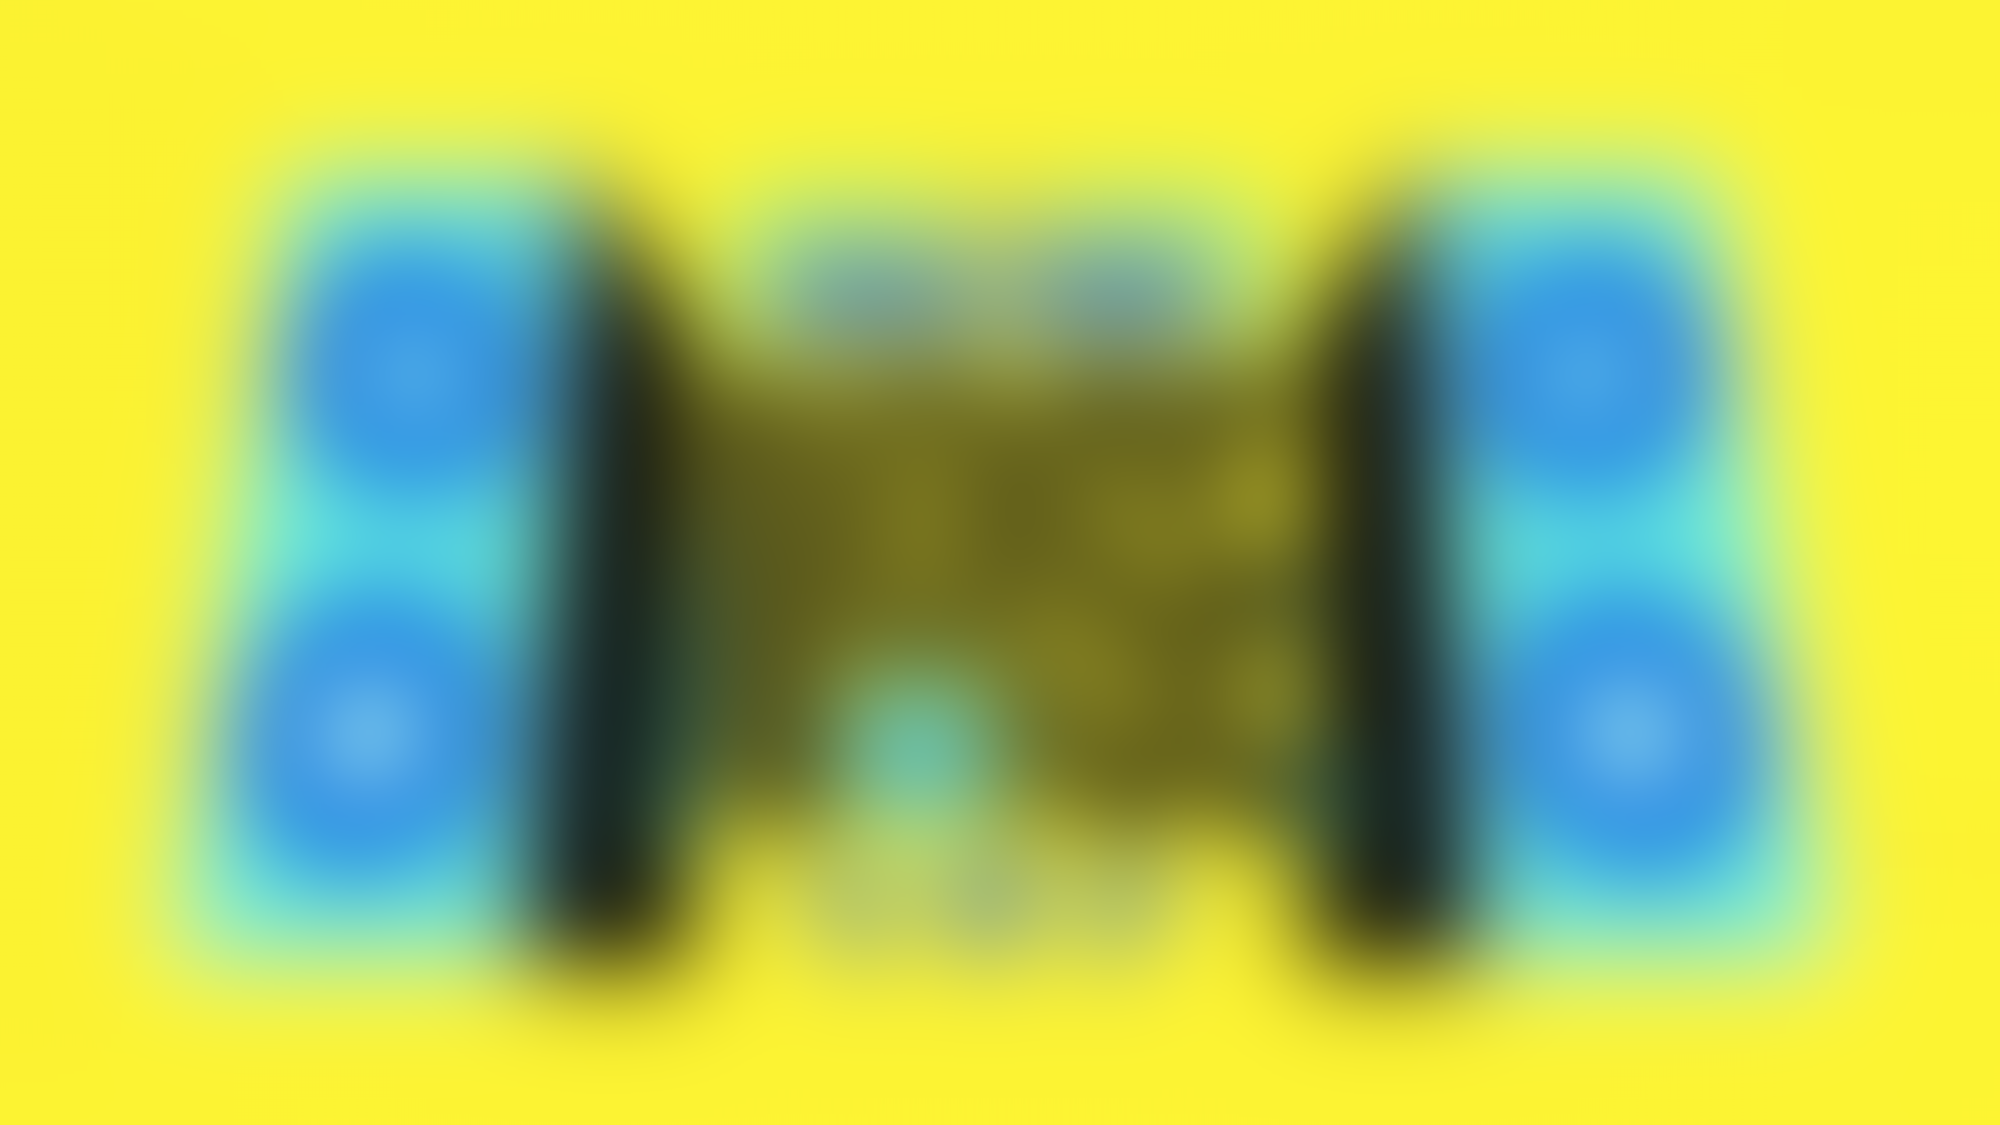 Jordan painter motion lecture in progress 0310 autocompressfitresizeixlibphp 1 1 0max h2000max w3 D2000q80sa6c9124cbb19d2705e7a96ae2eefa83b